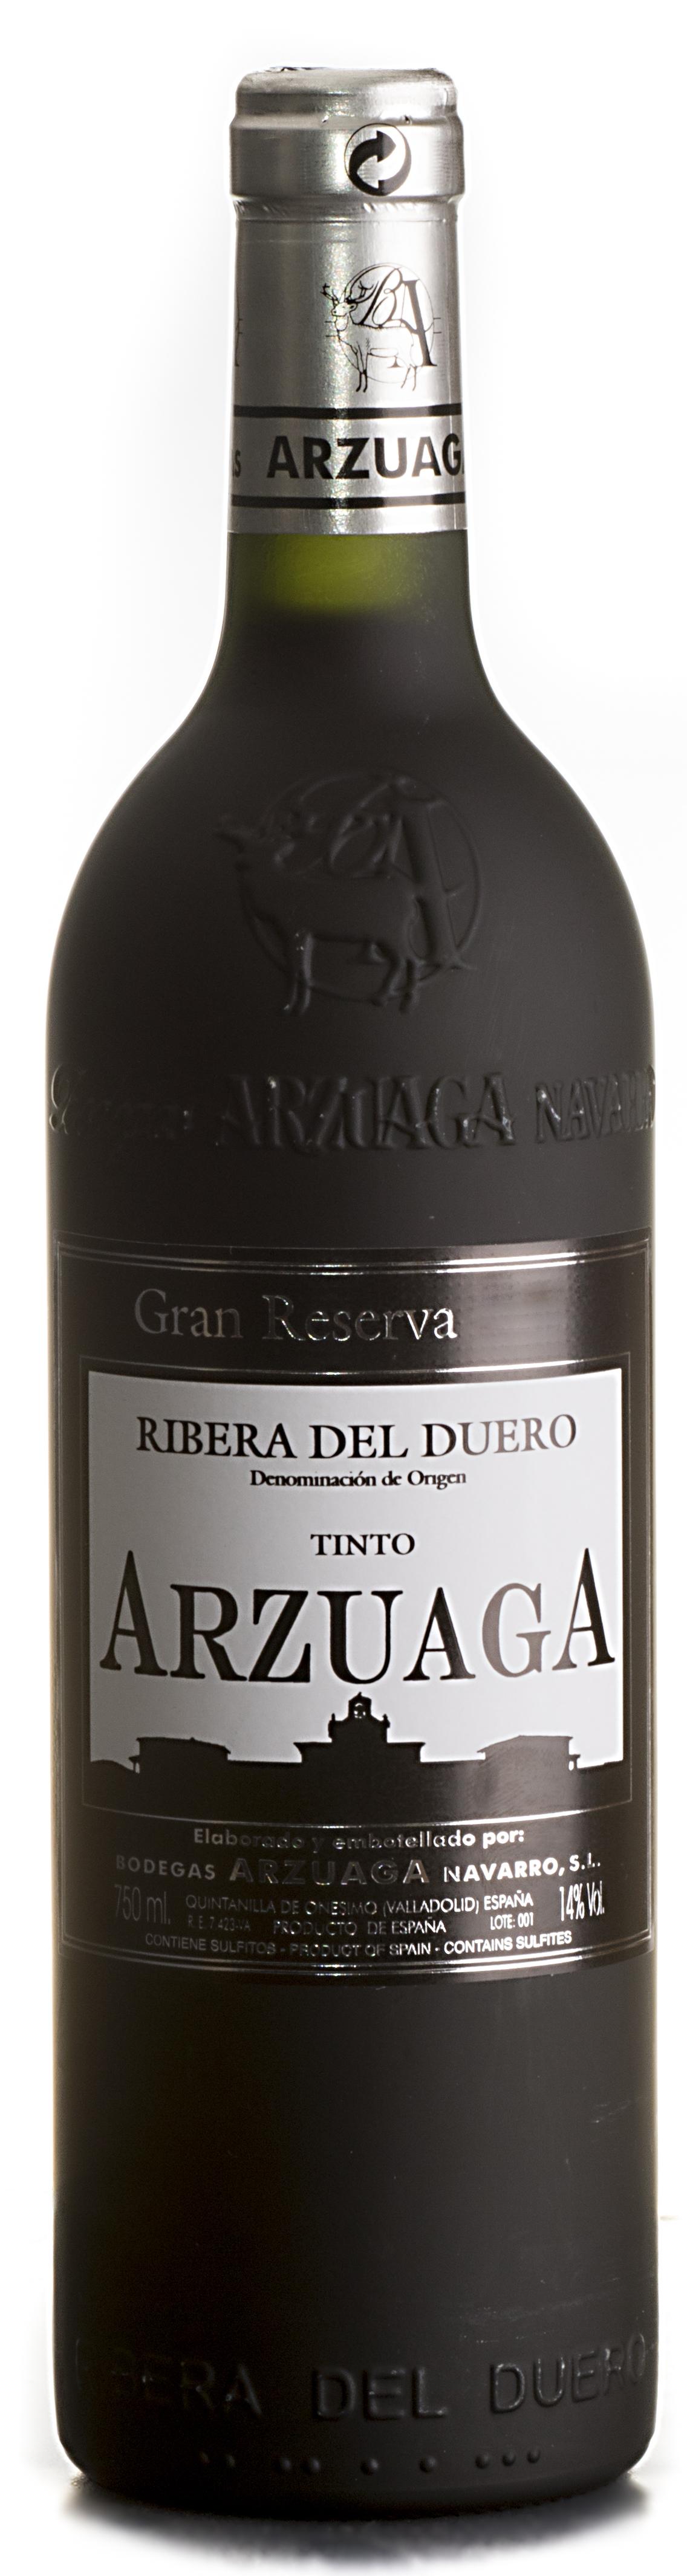 Gran Reserva | Arzuaga - Winexfood